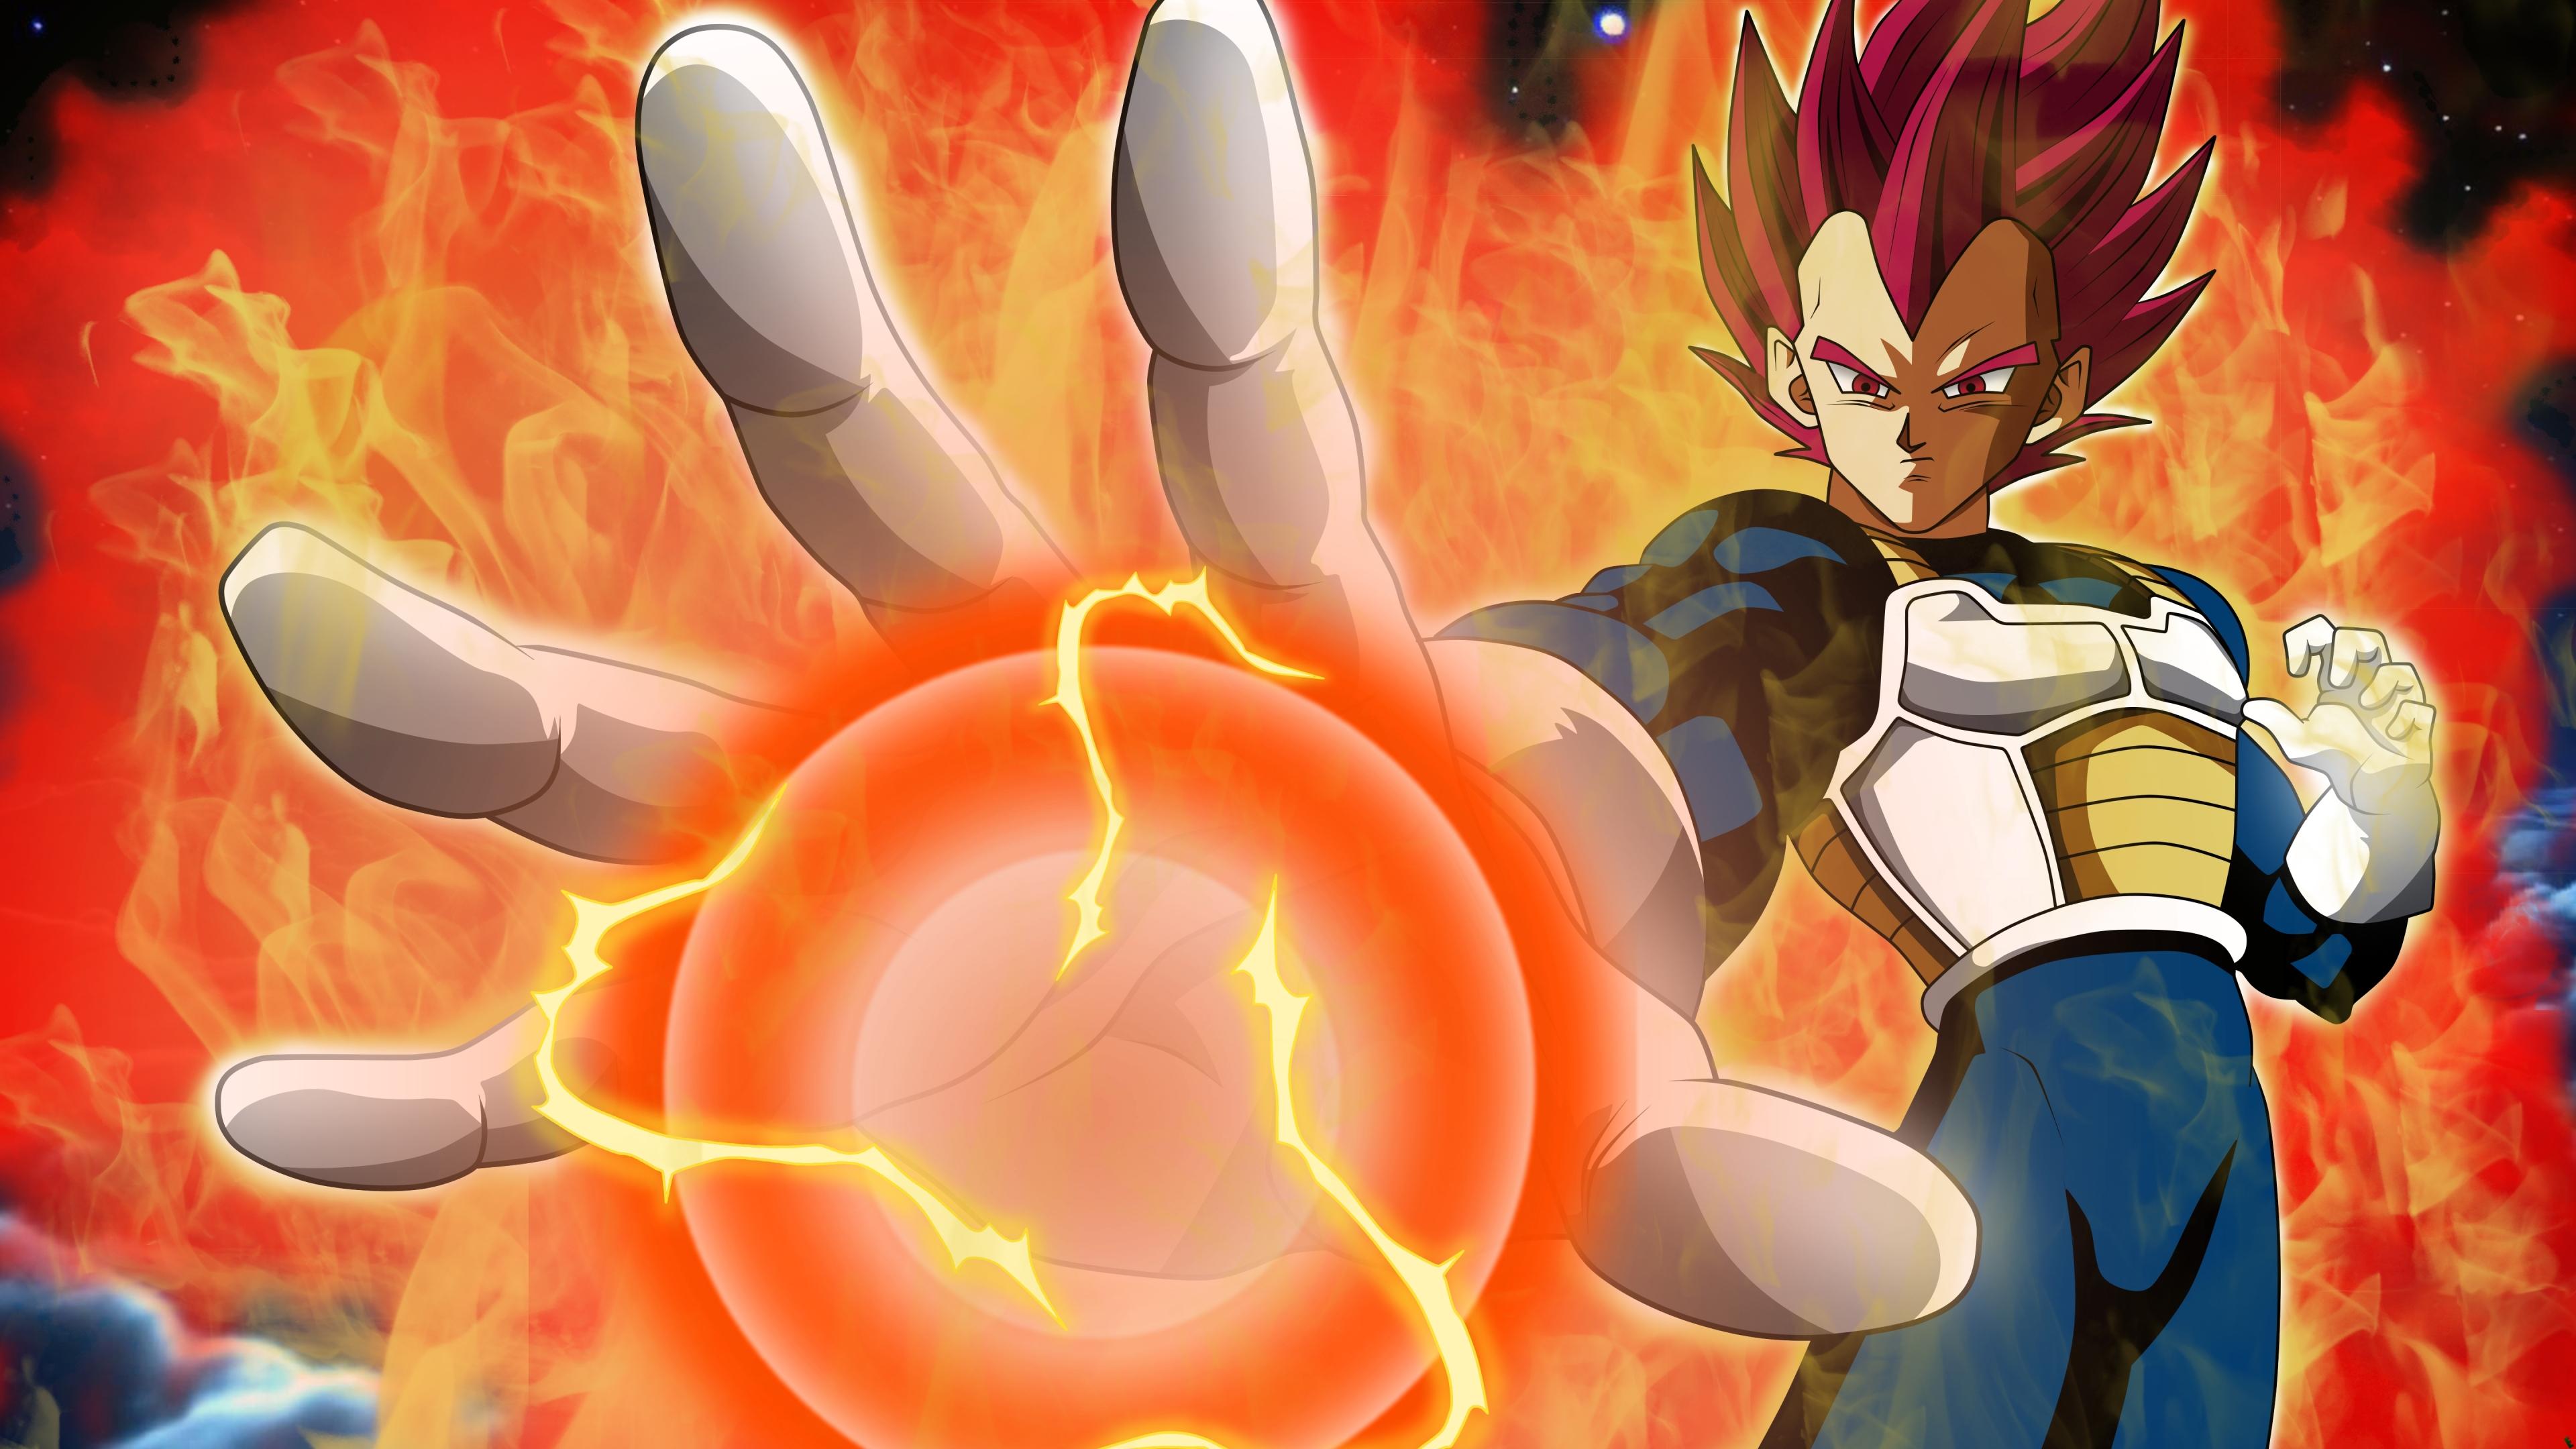 Vegeta Ssjg Super Saiyan God From Dragon Ball Anime Wallpaper Id 4991